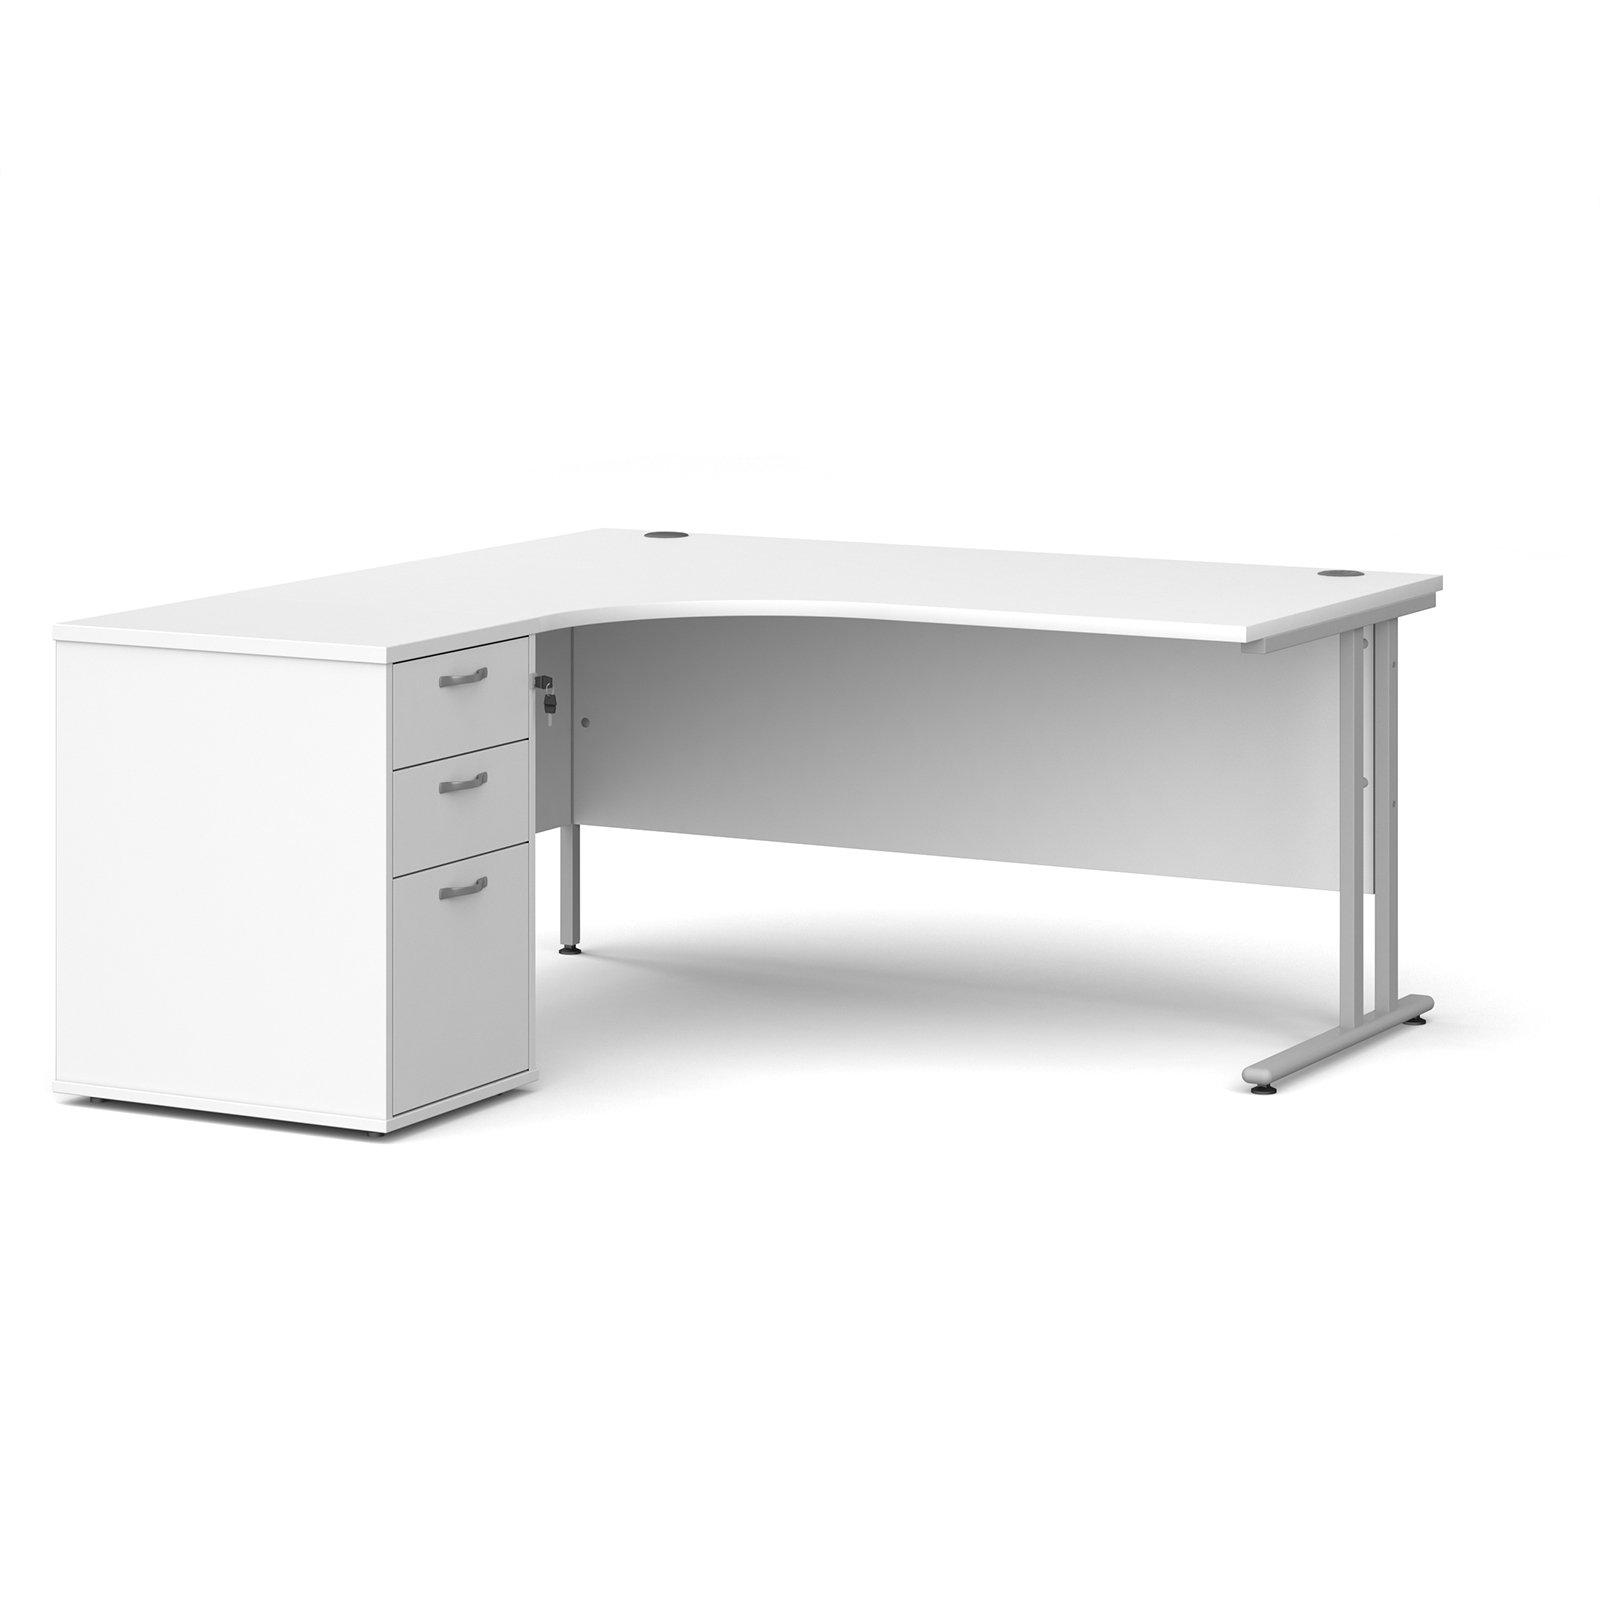 Maestro 25 left hand ergonomic desk 1600mm with silver cantilever frame and desk high pedestal - white